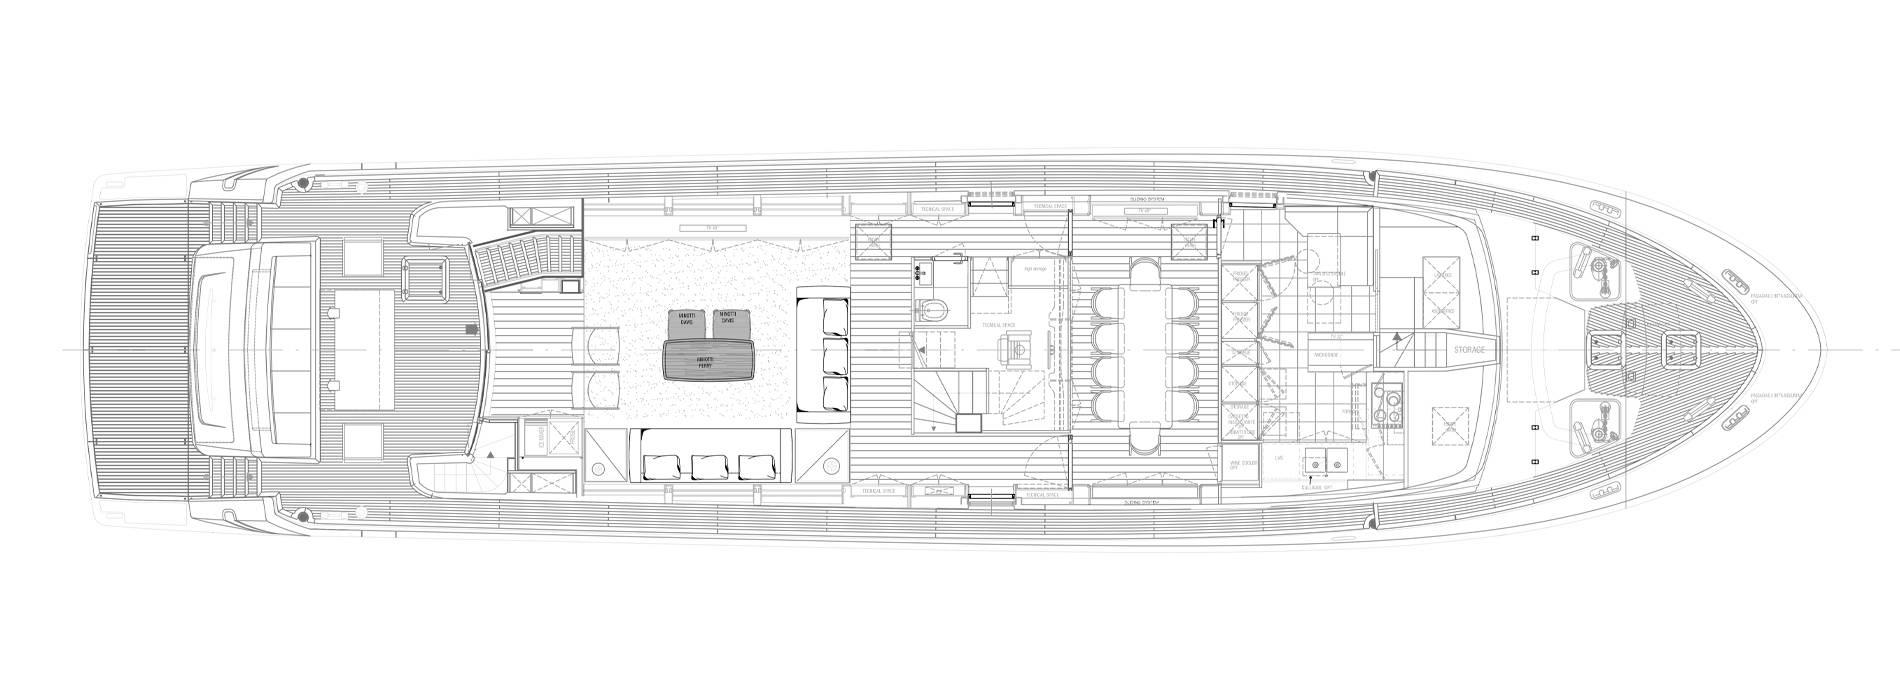 Sanlorenzo Yachts SL96-631 Главная палуба